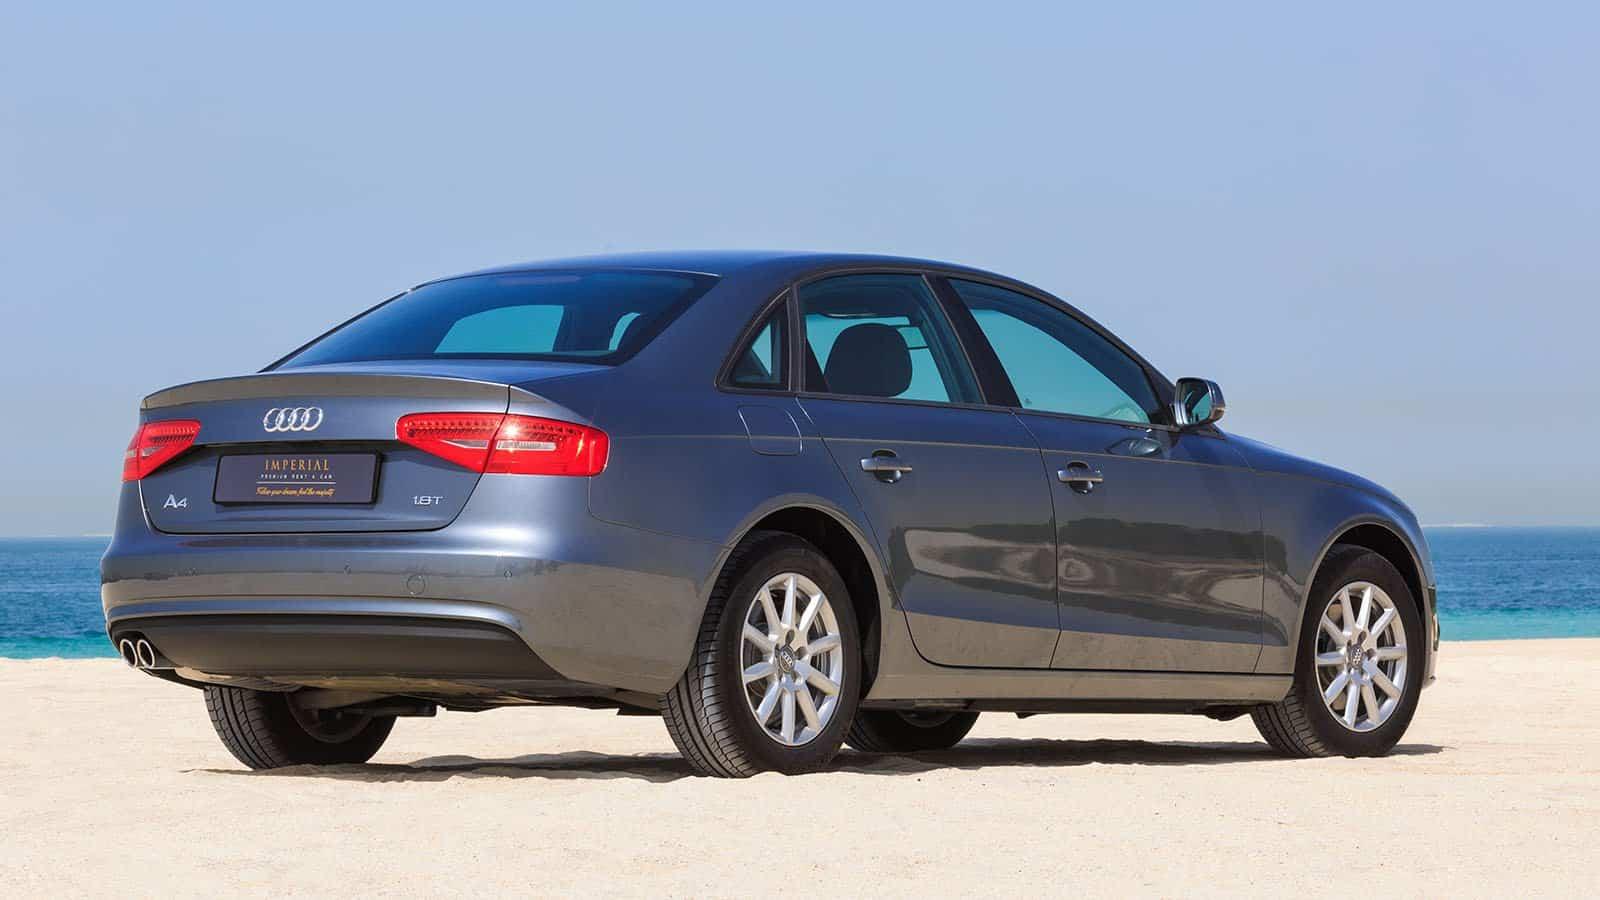 Audi A4 car Rental Car Dubai